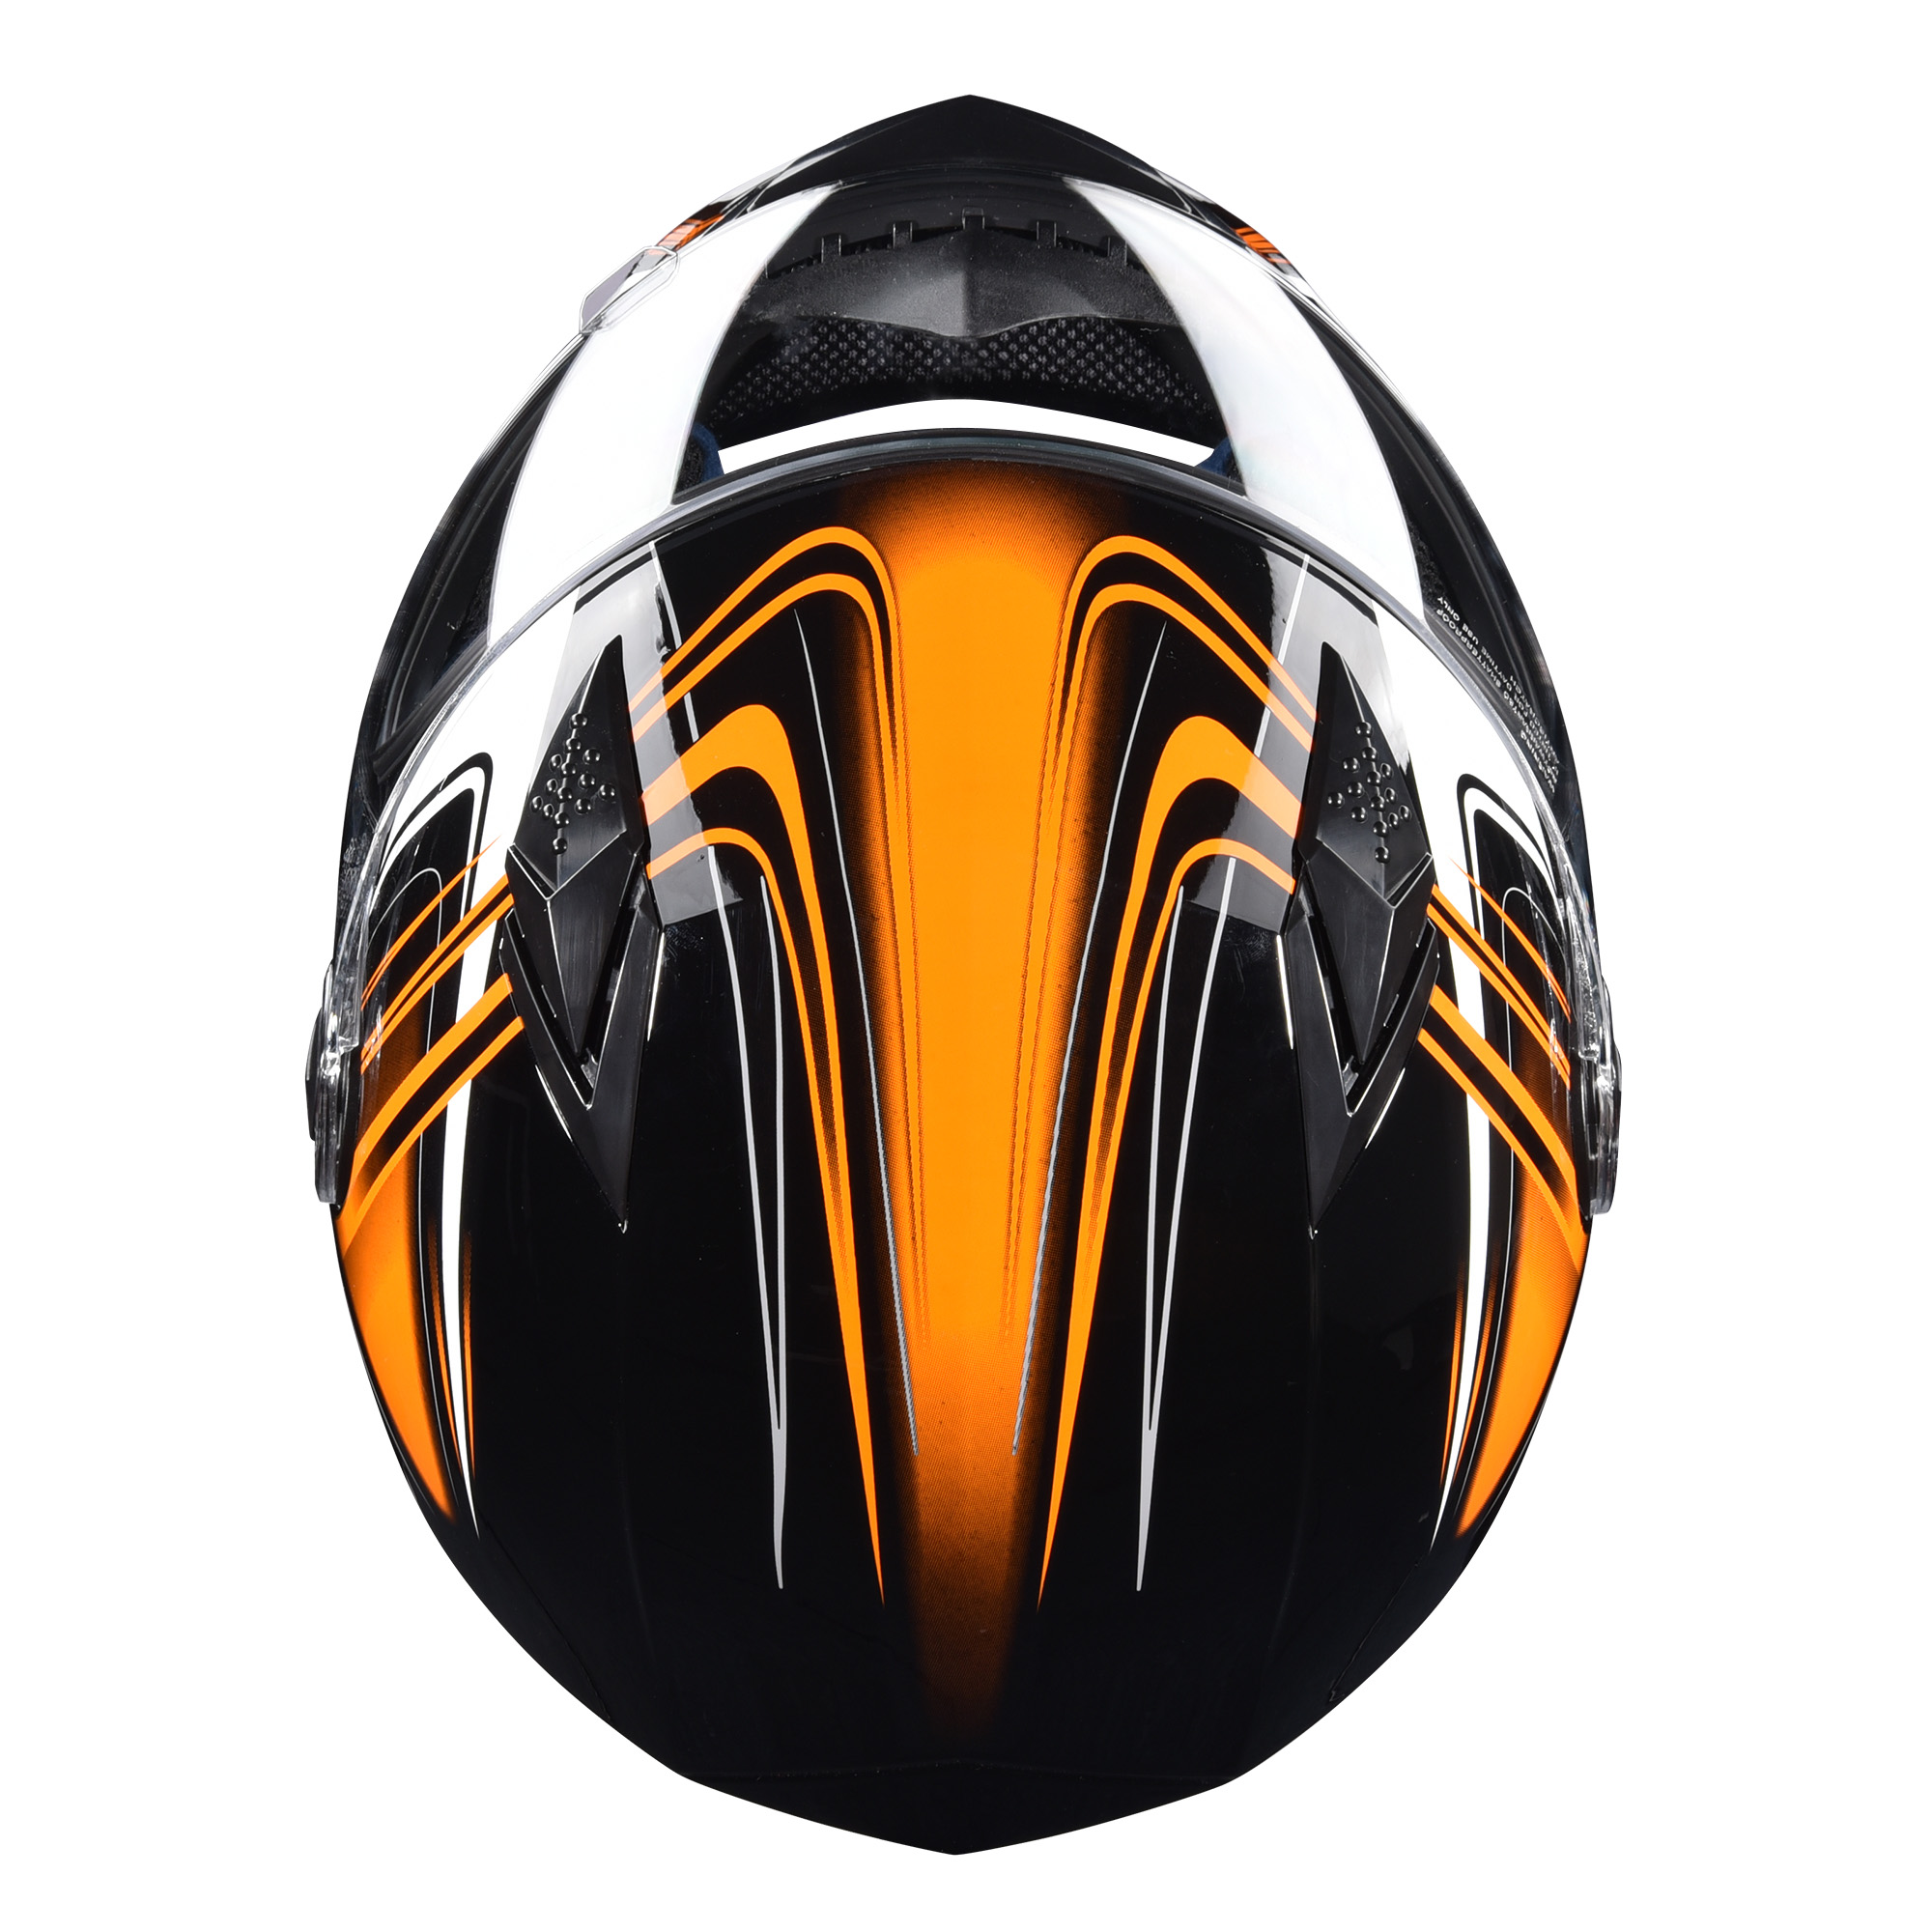 miniature 42 - AHR K12 Full Face Motorcycle Helmet DOT Air Vents Clear Visor Racing S M L XL